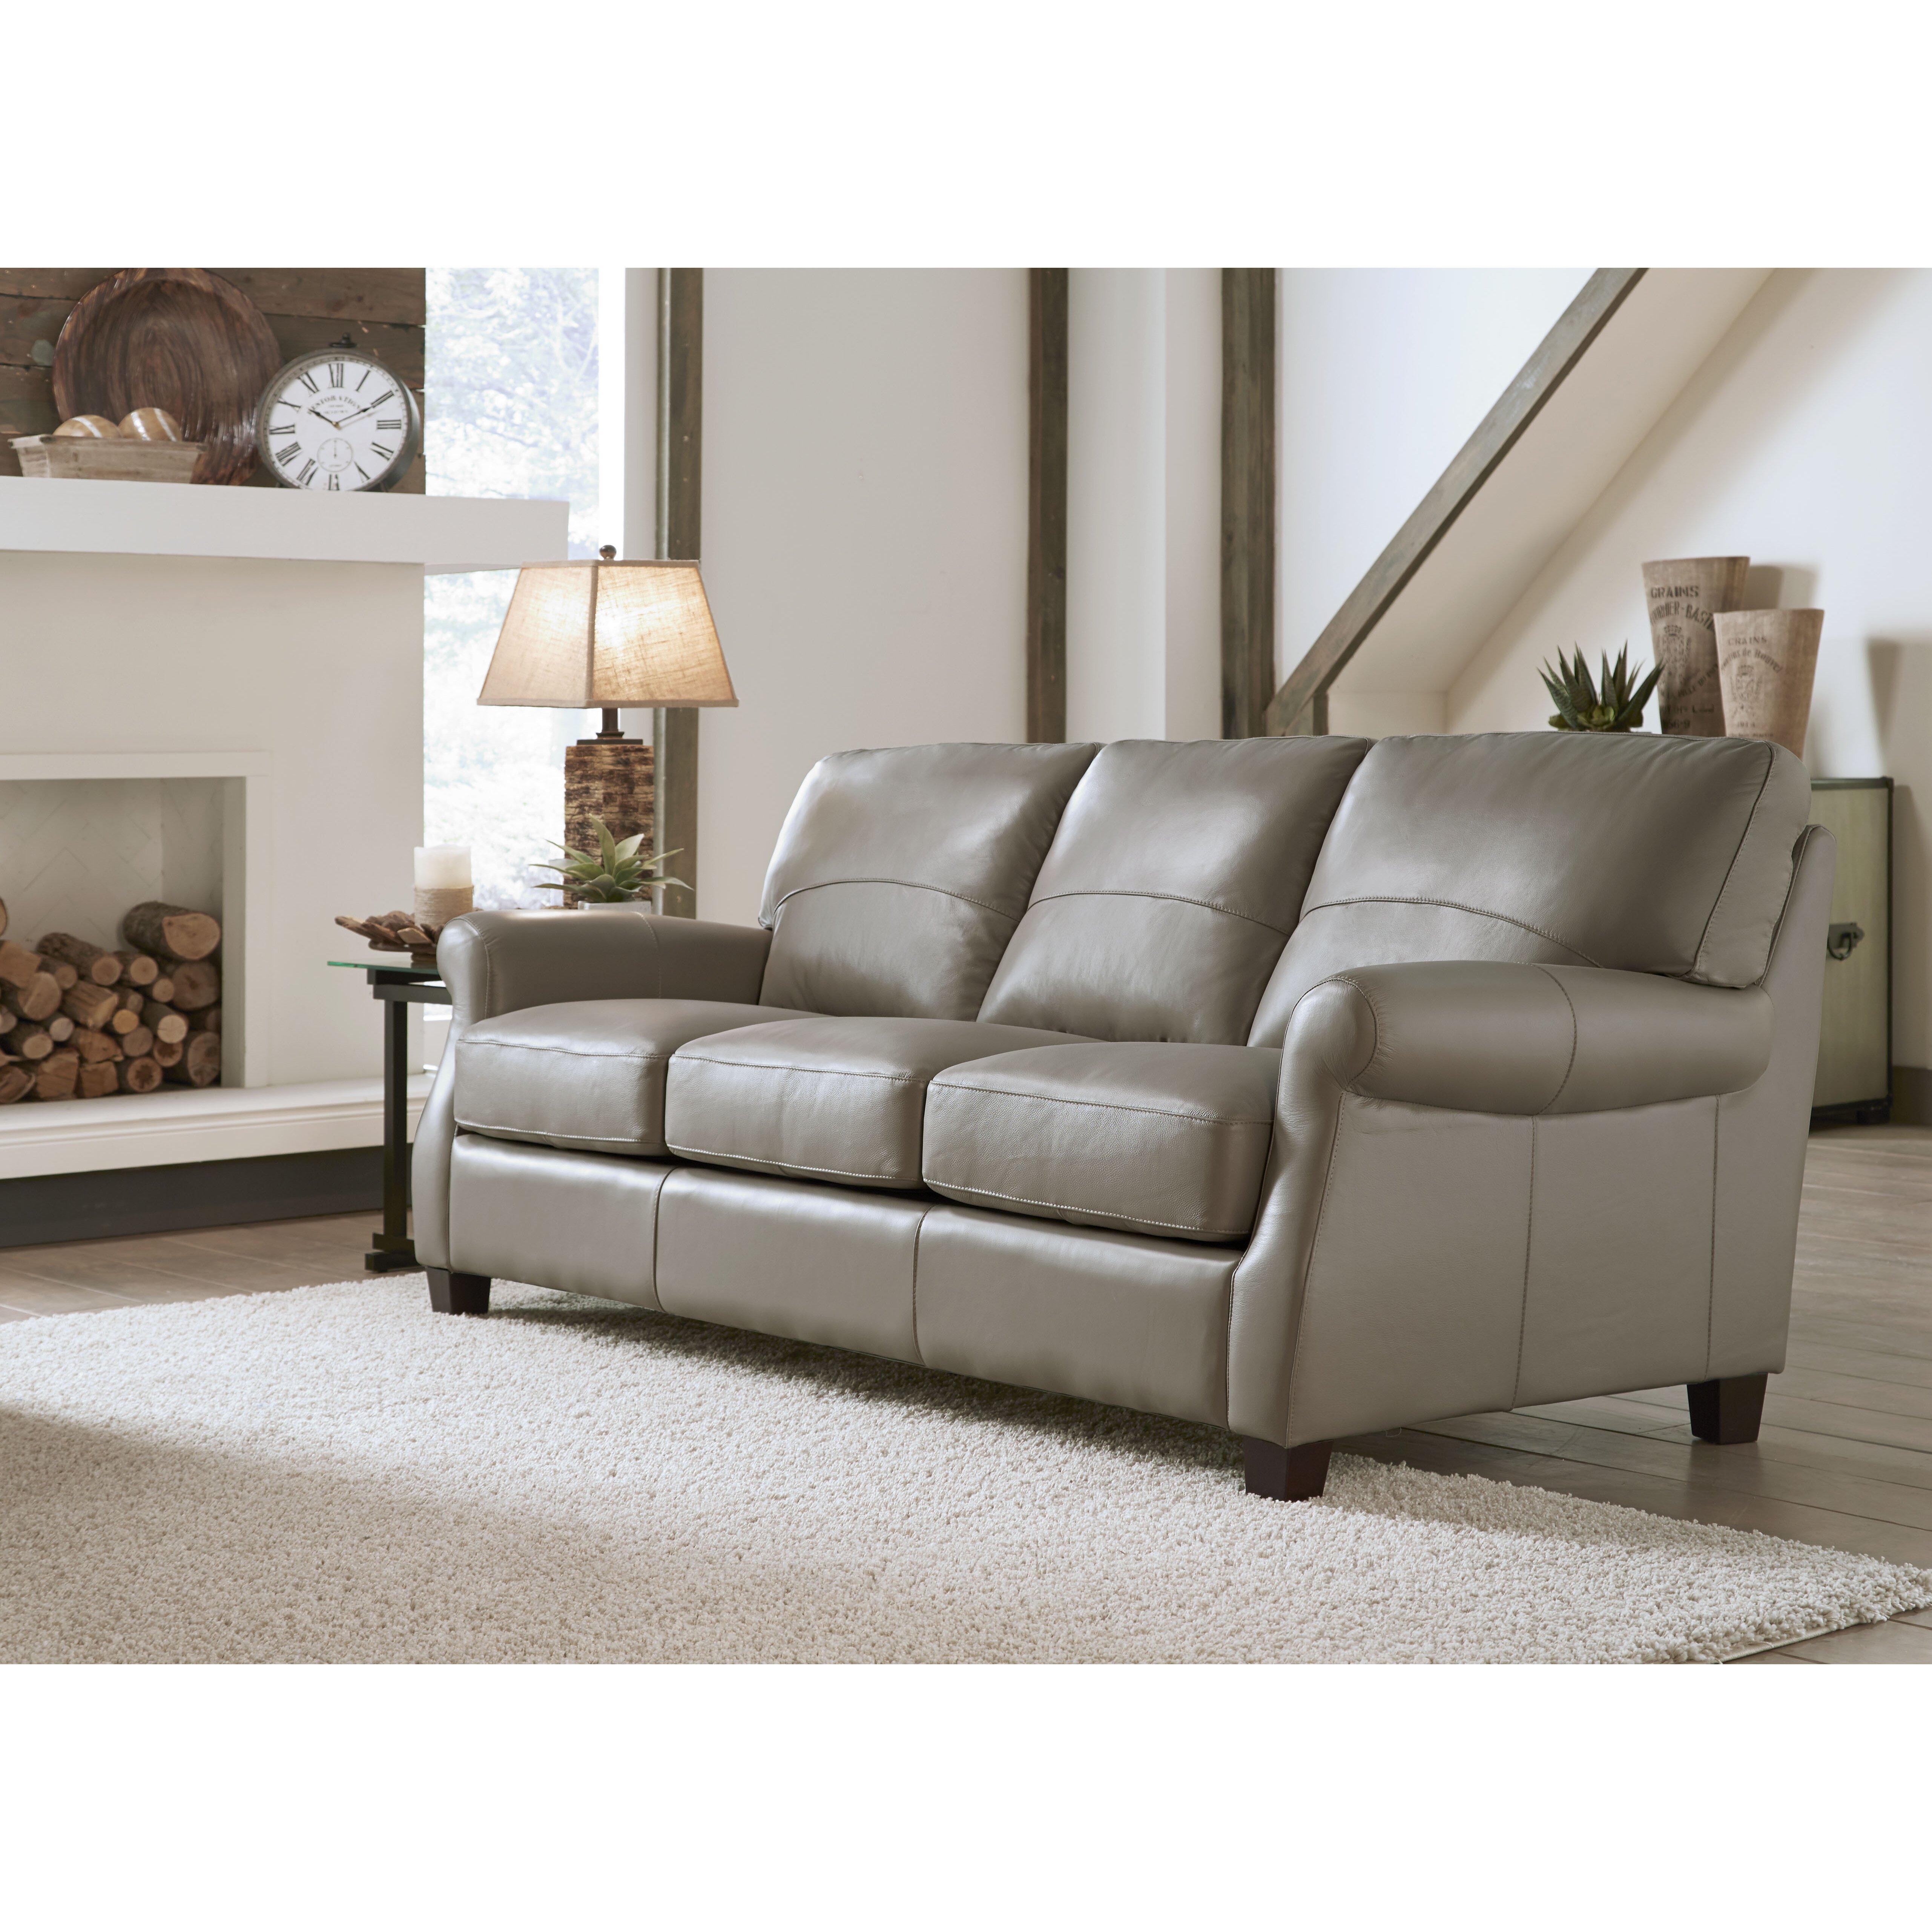 Lazzaro Leather Carlisle Leather Sofa Reviews